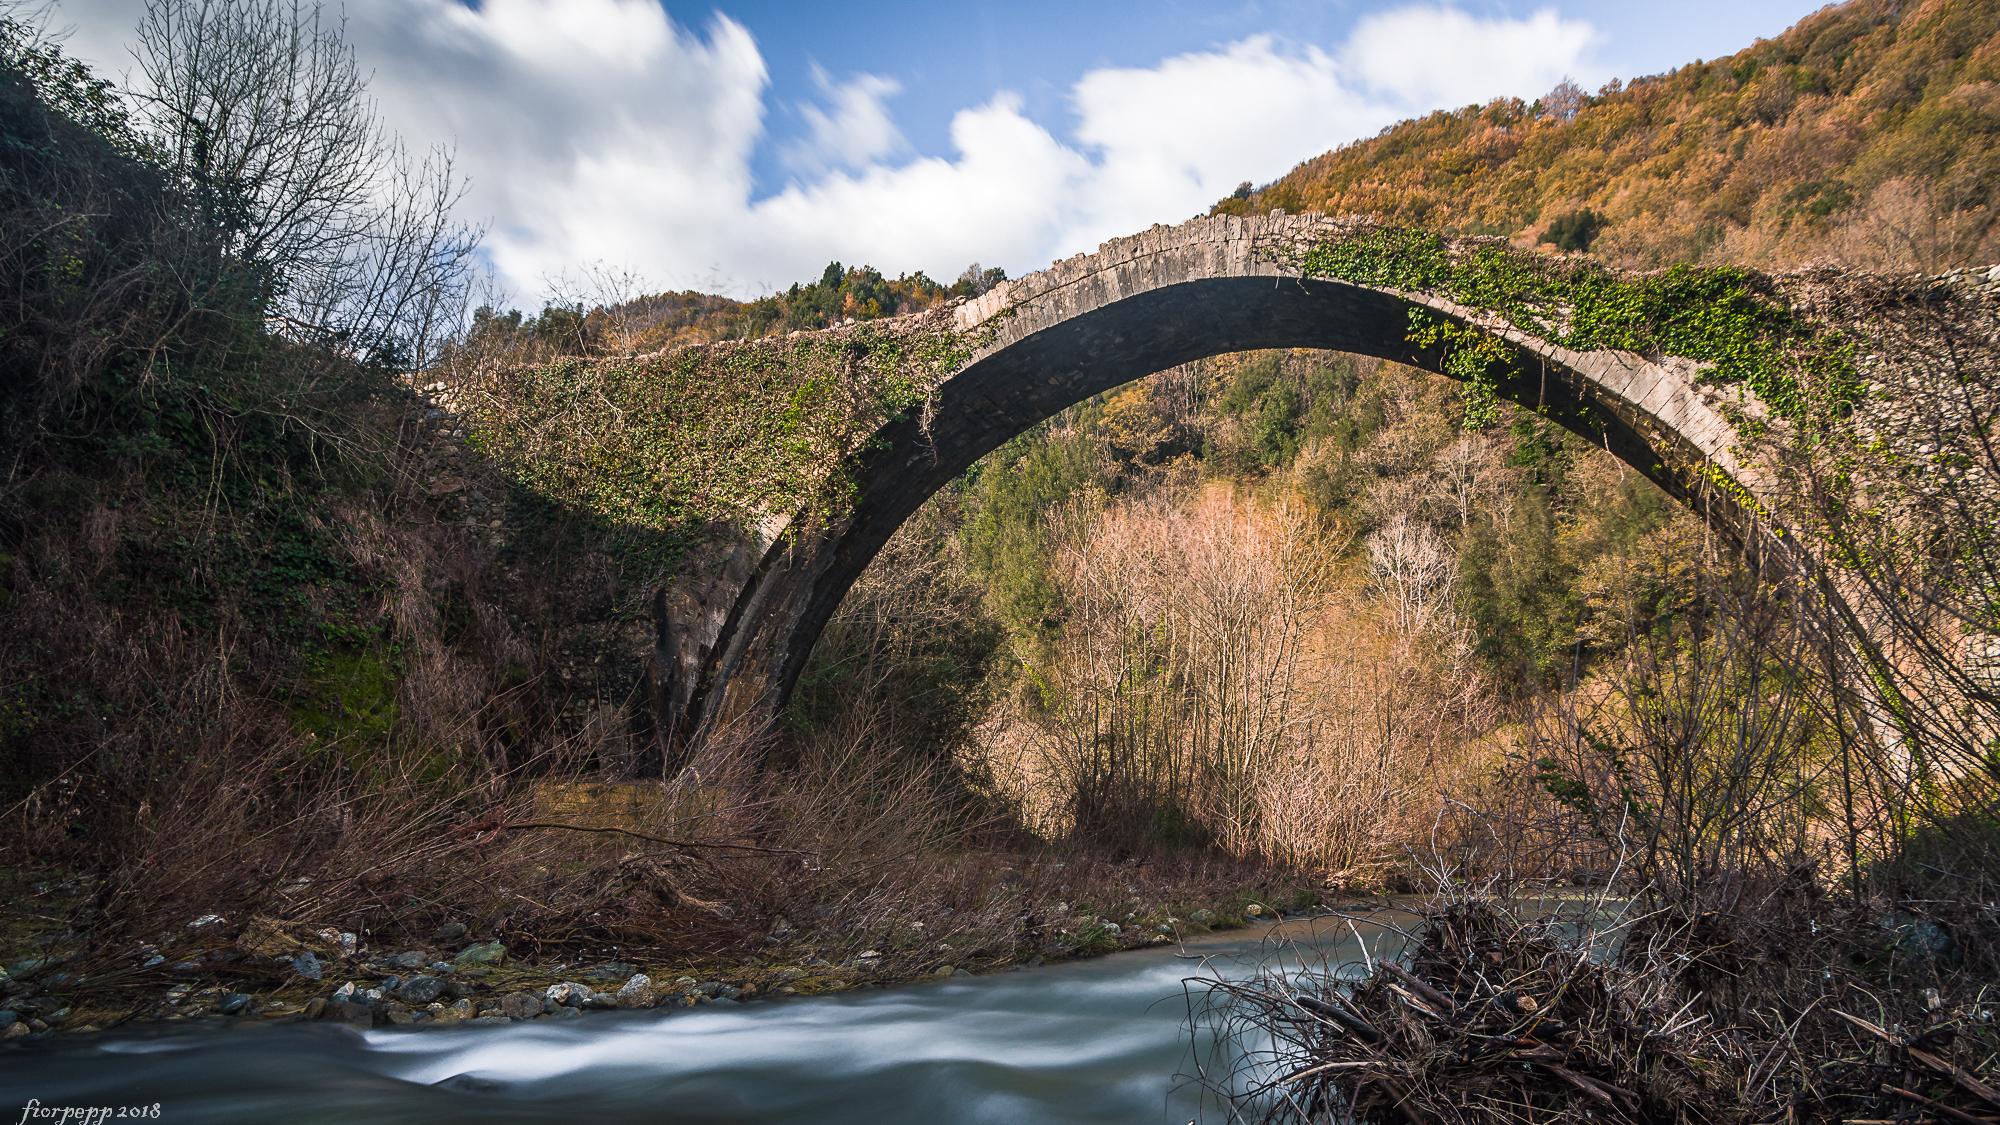 Oldest Roman bridge in Italy...